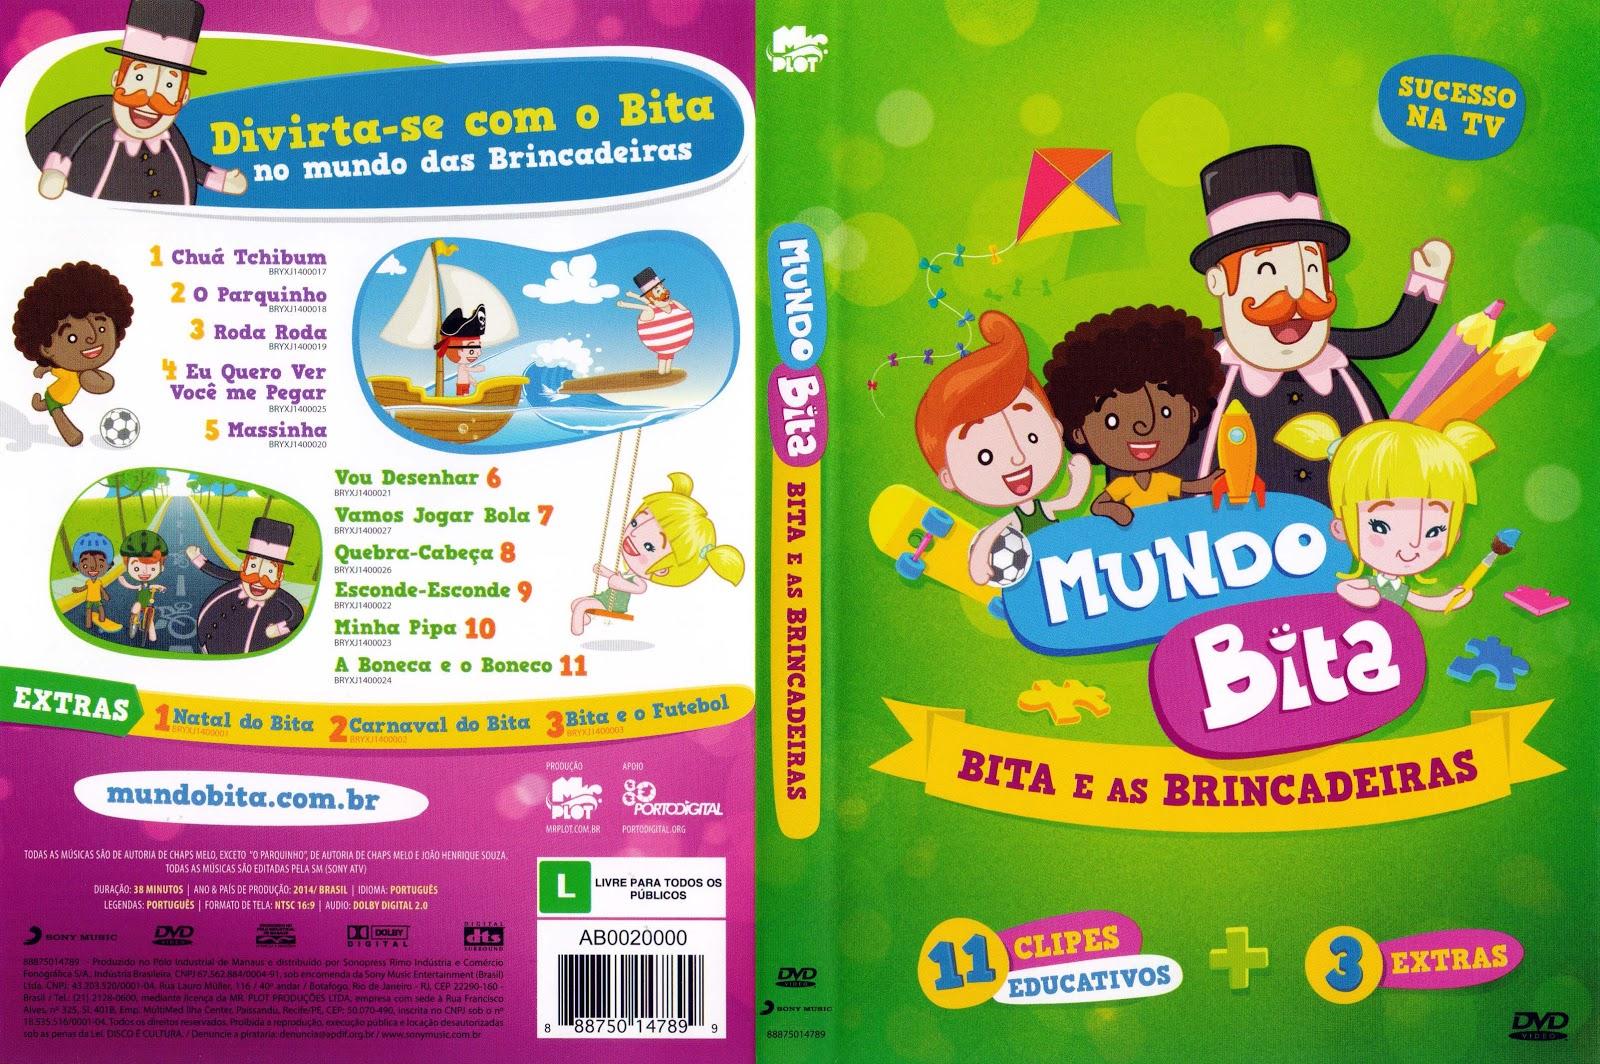 Capa DVD Mundo Bita Bita EAs Brincadeiras